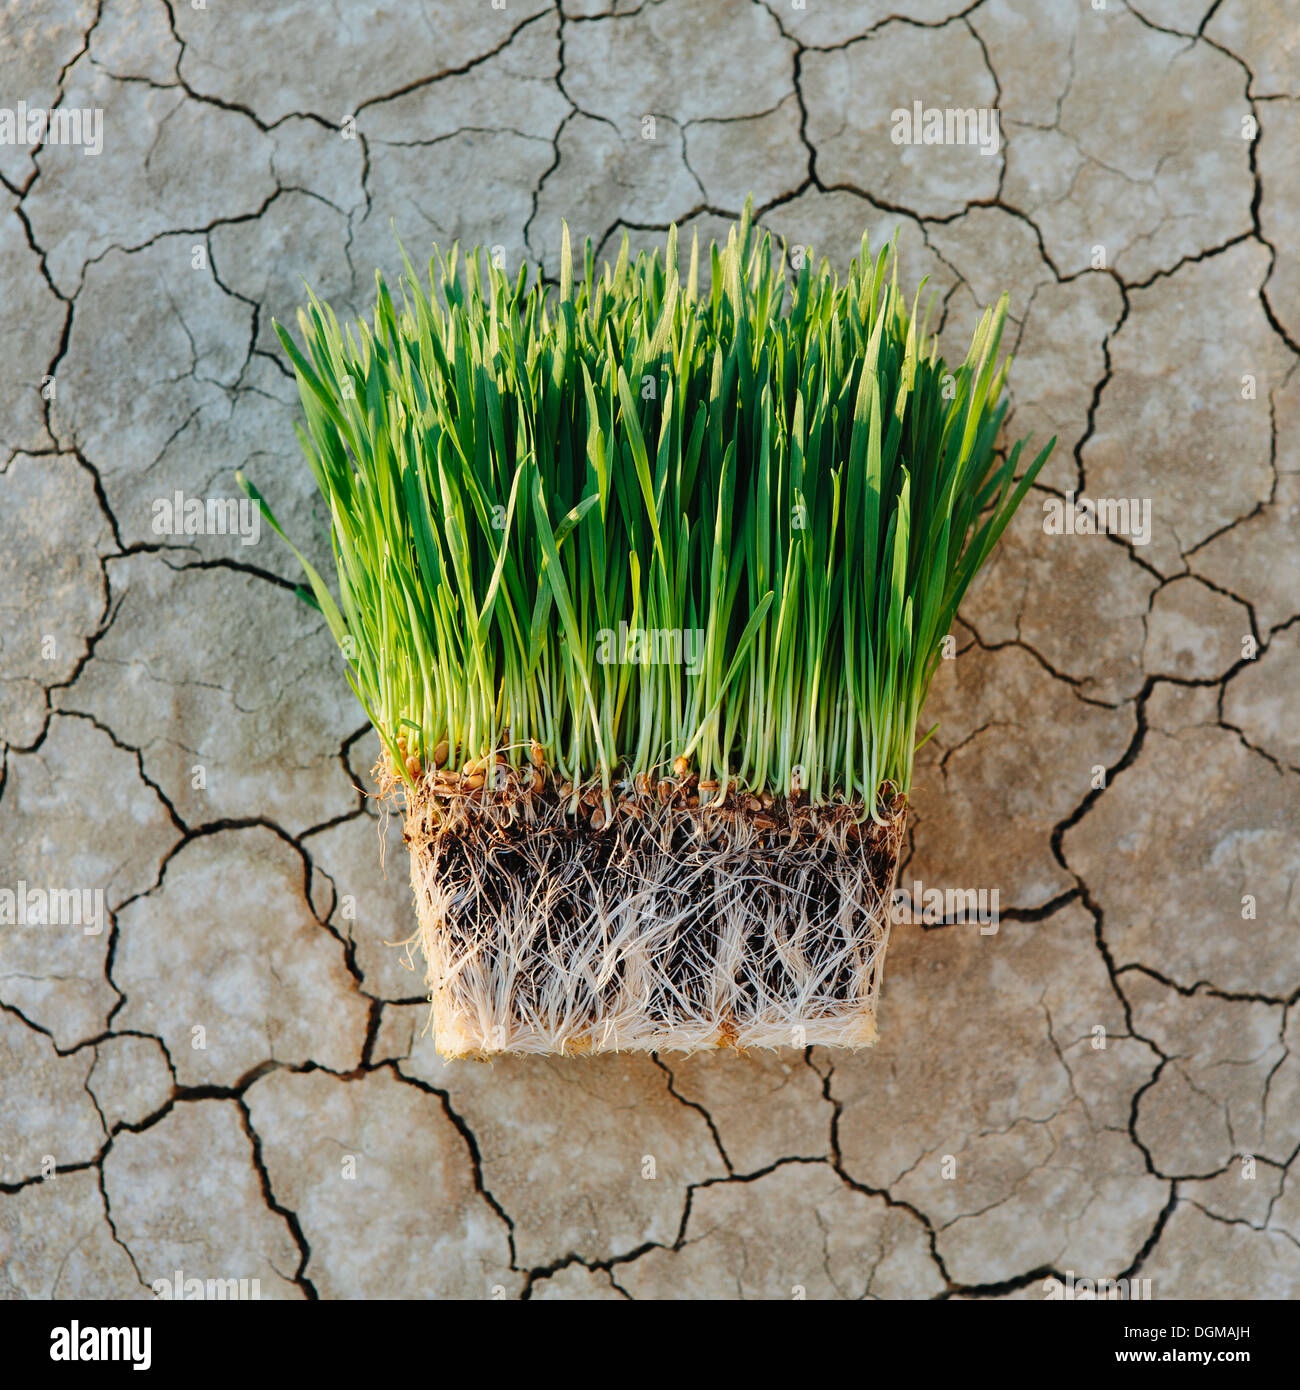 Black Rock Desert Arid cracked crusty surface salt flat playa Wheatgrass plants with a dense network of roots - Stock Image